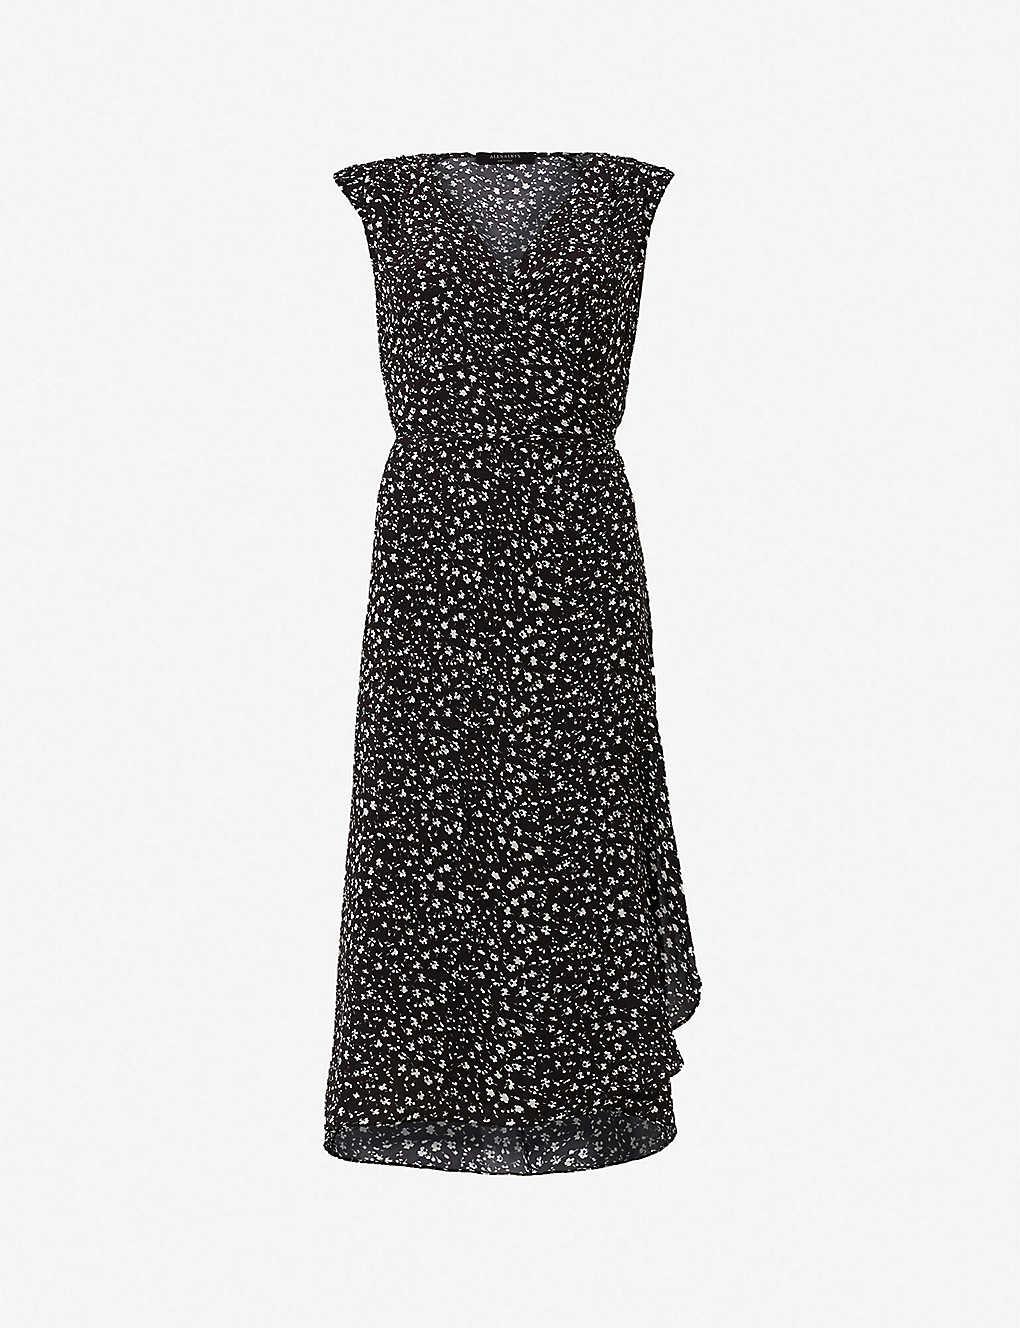 96ba34947d26 ALLSAINTS - Krystie Pippa floral print dress | Selfridges.com